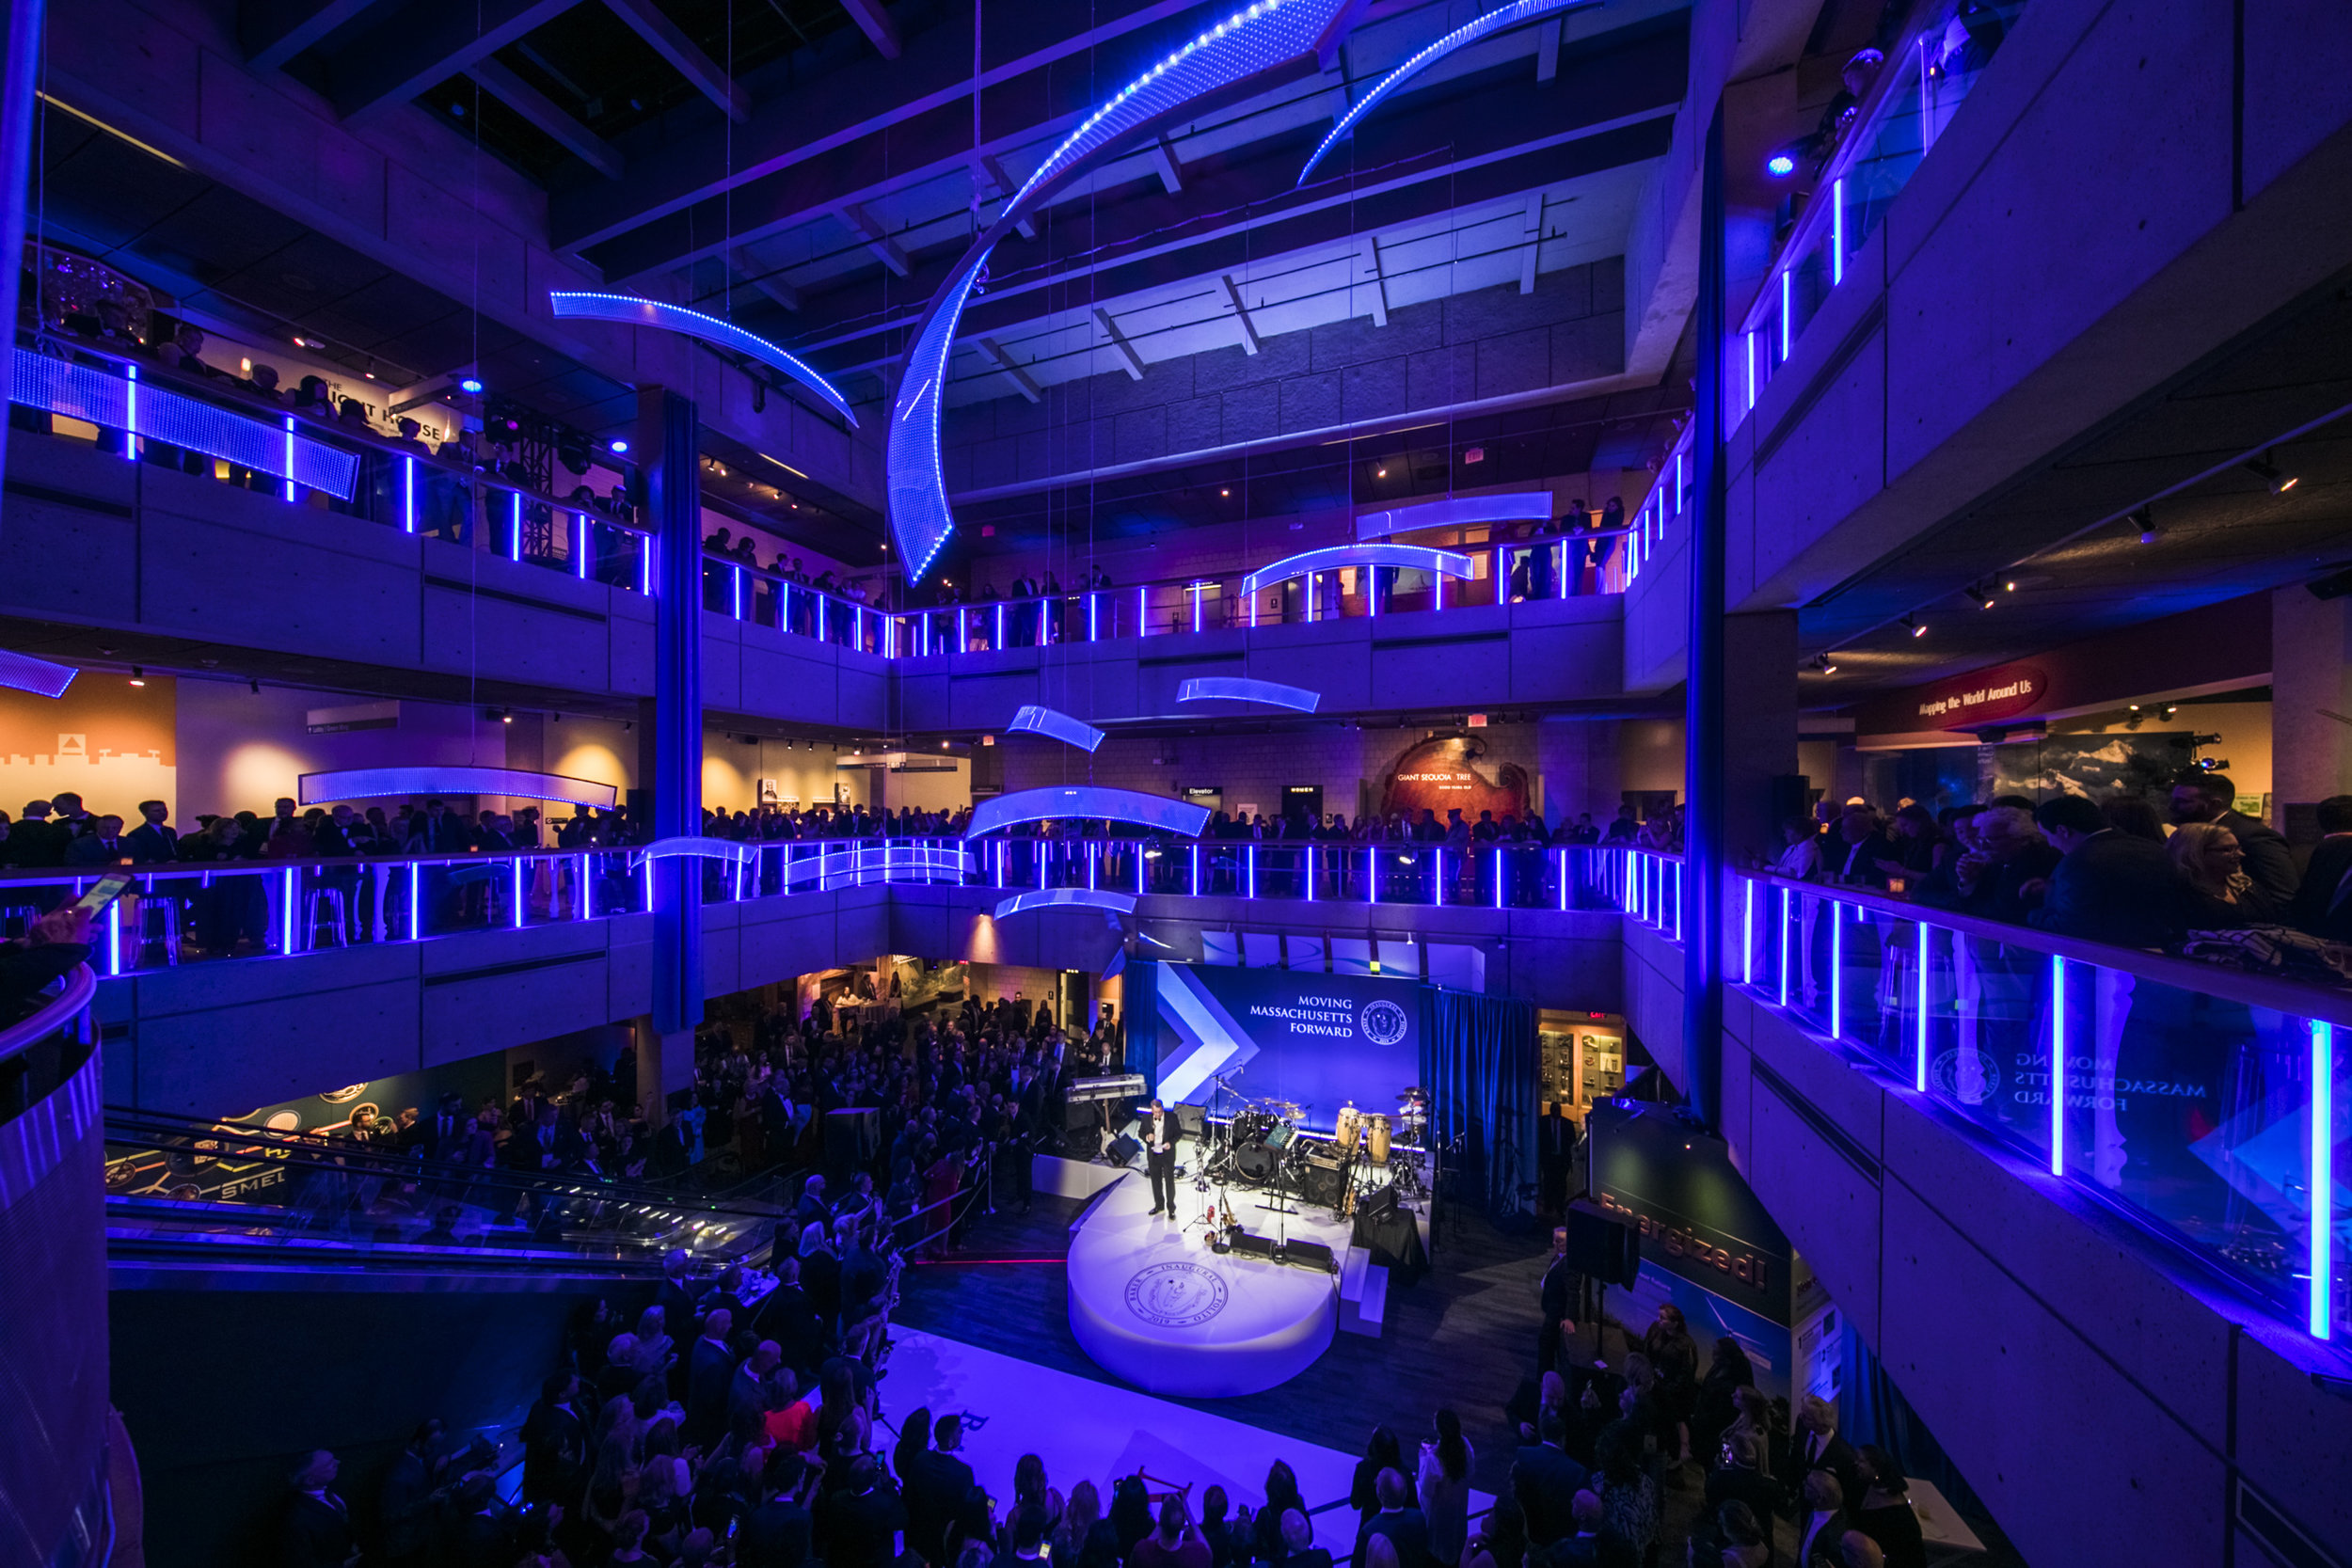 Port Lighting Systems Massachusetts Governors Inauguration Astera Titan Tubes Boston Museum of Science.jpg